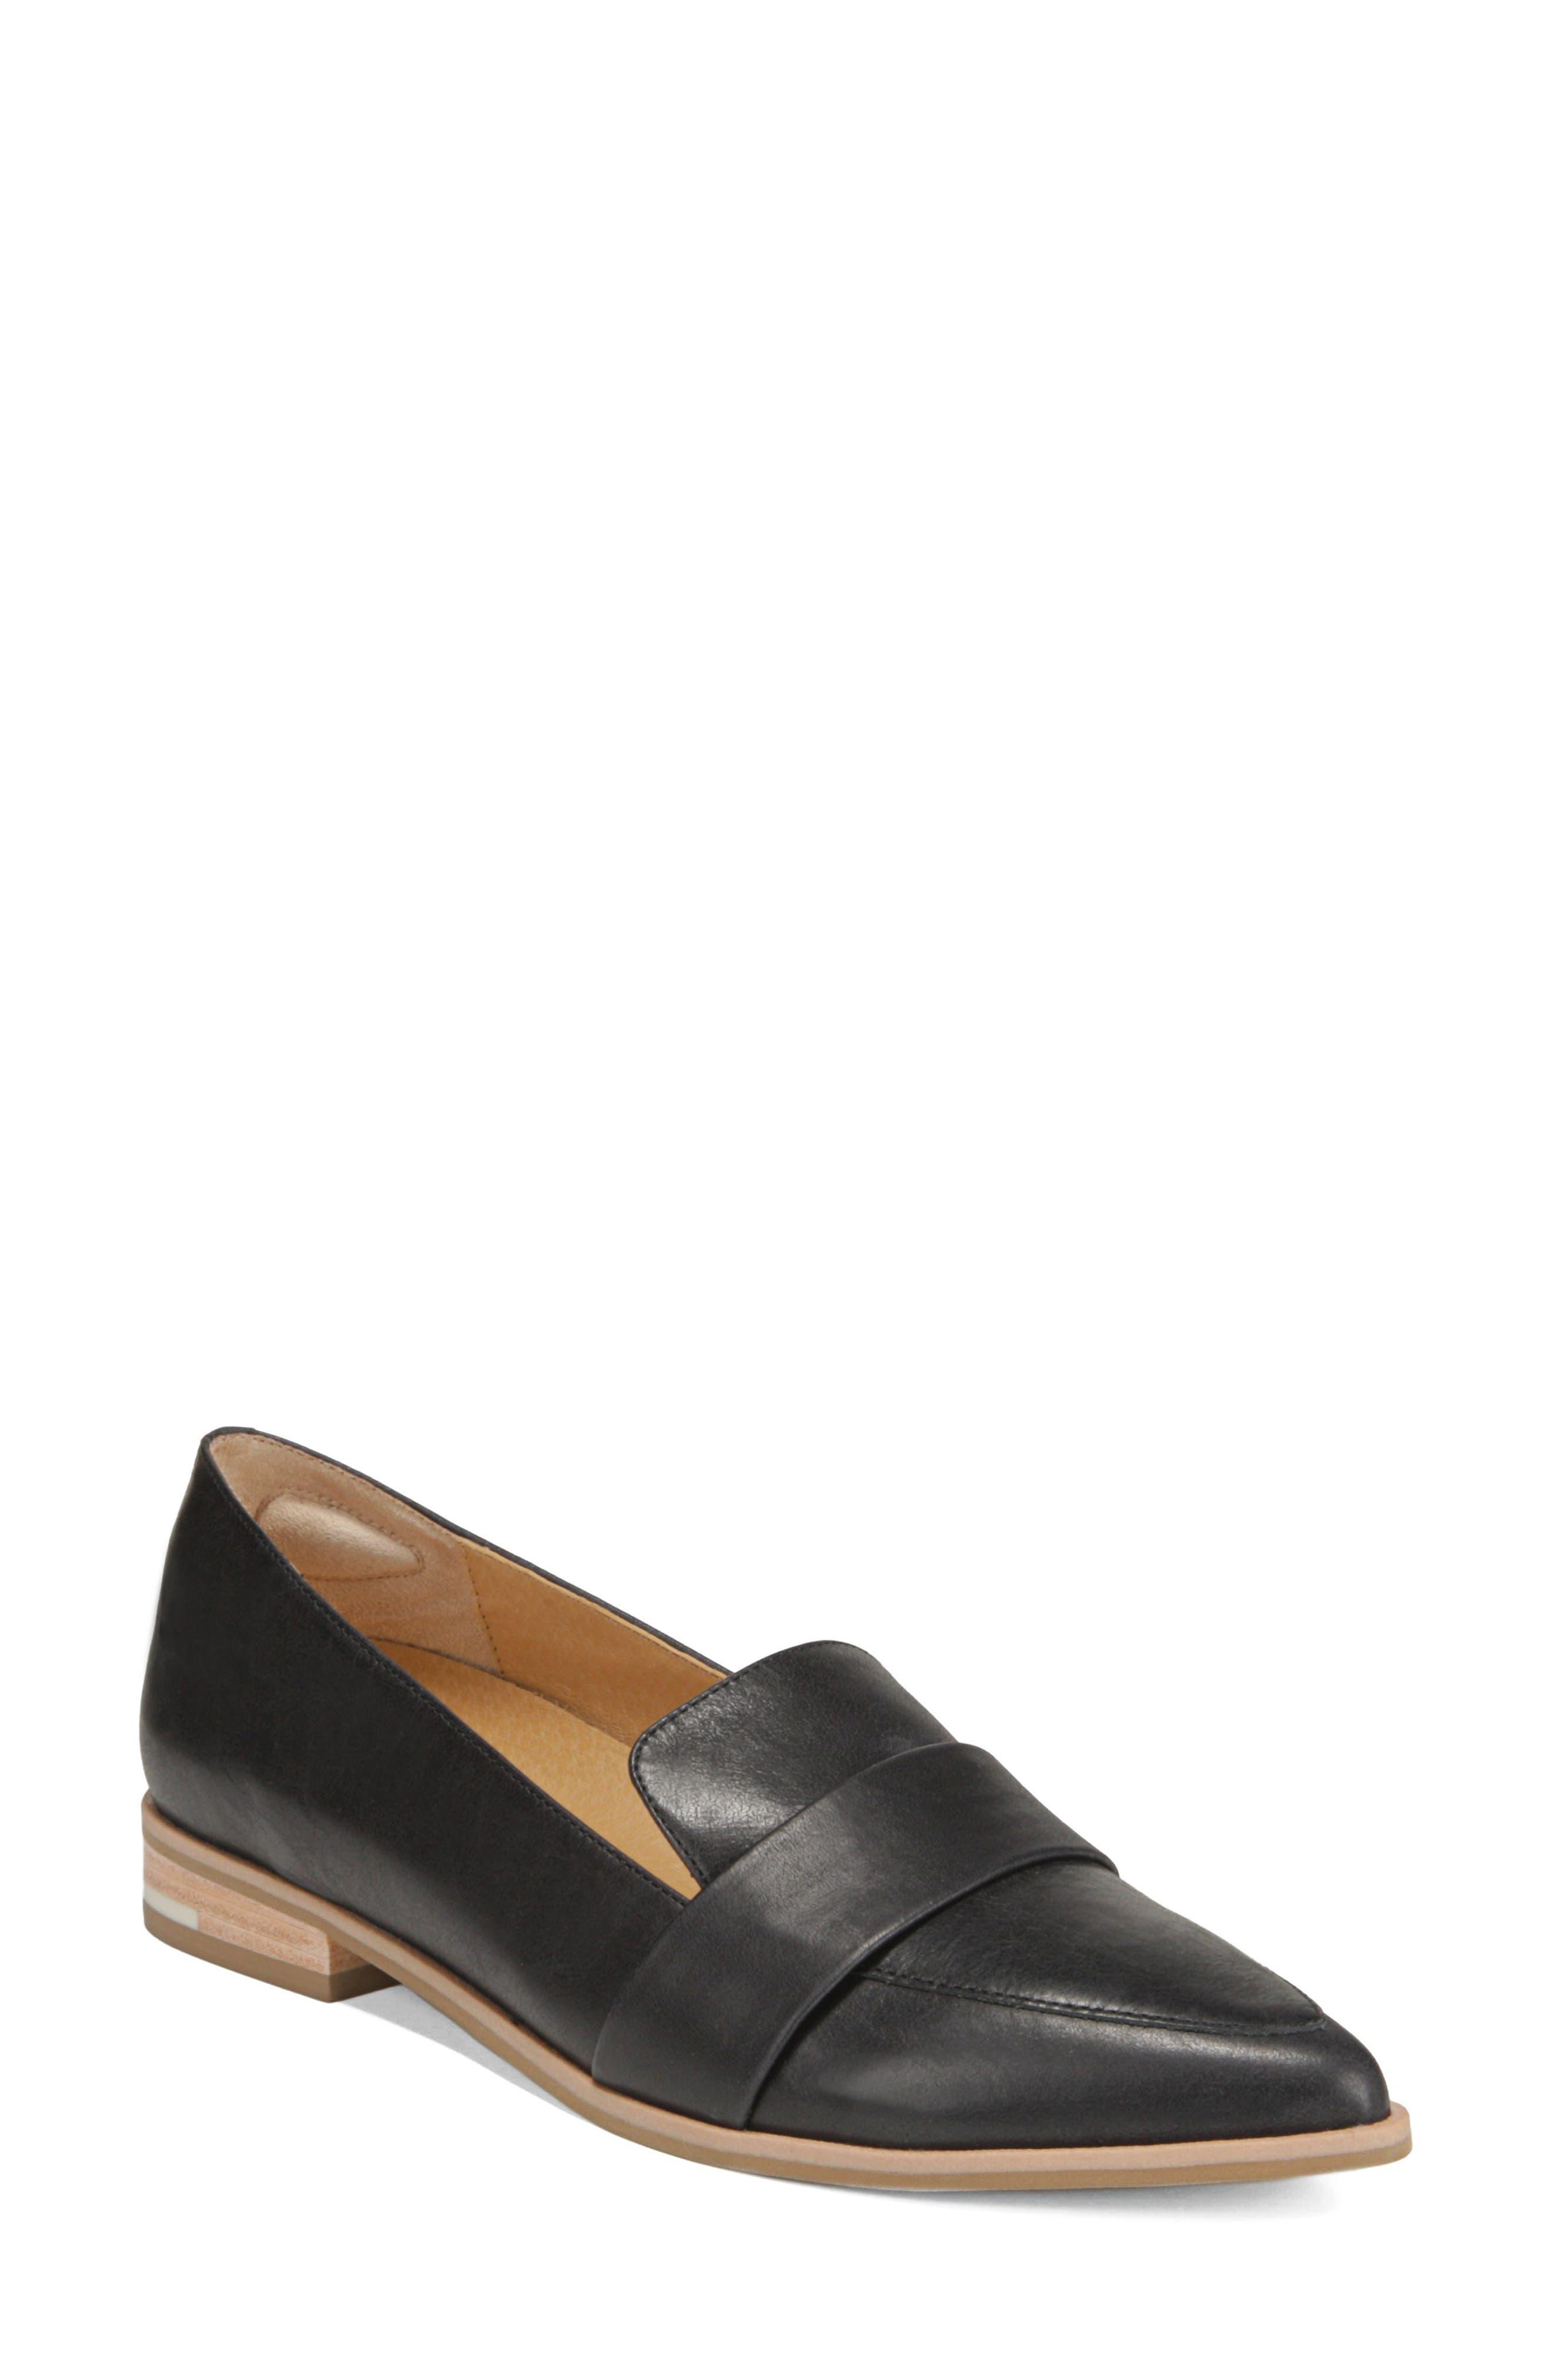 Faxon Loafer, Main, color, BLACK LEATHER